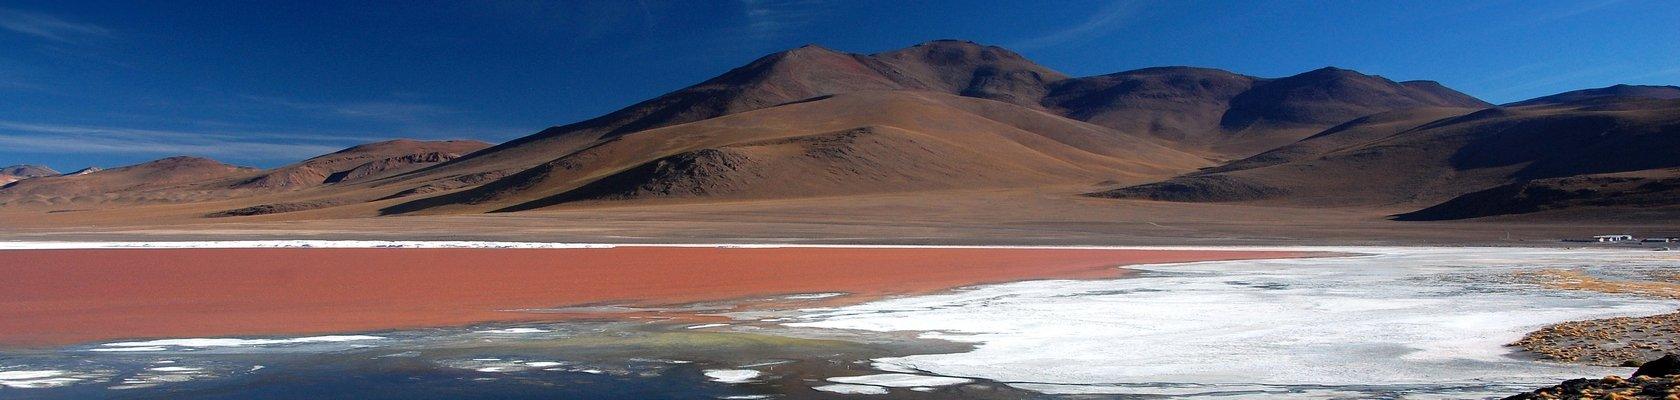 Laguna Colorada, Salar de Uyuni